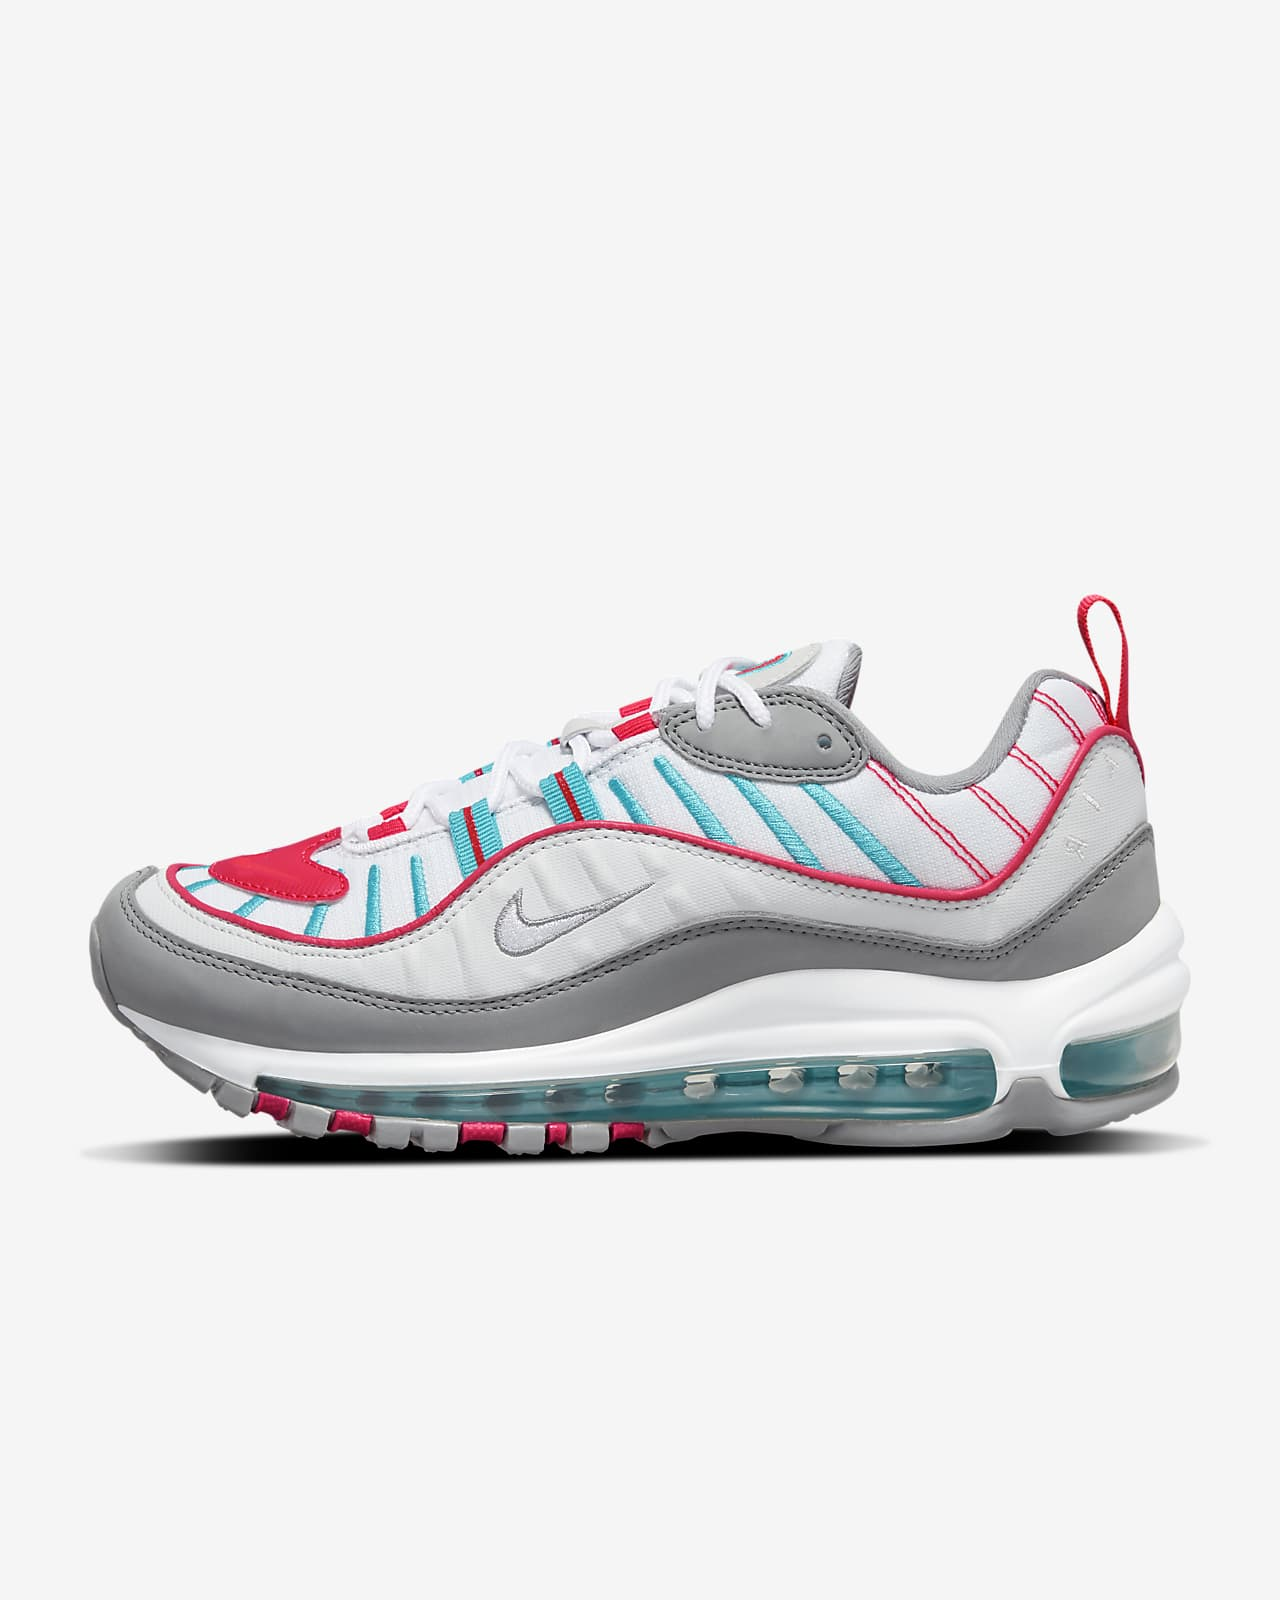 Nike Air Max 98 sko til kvinder